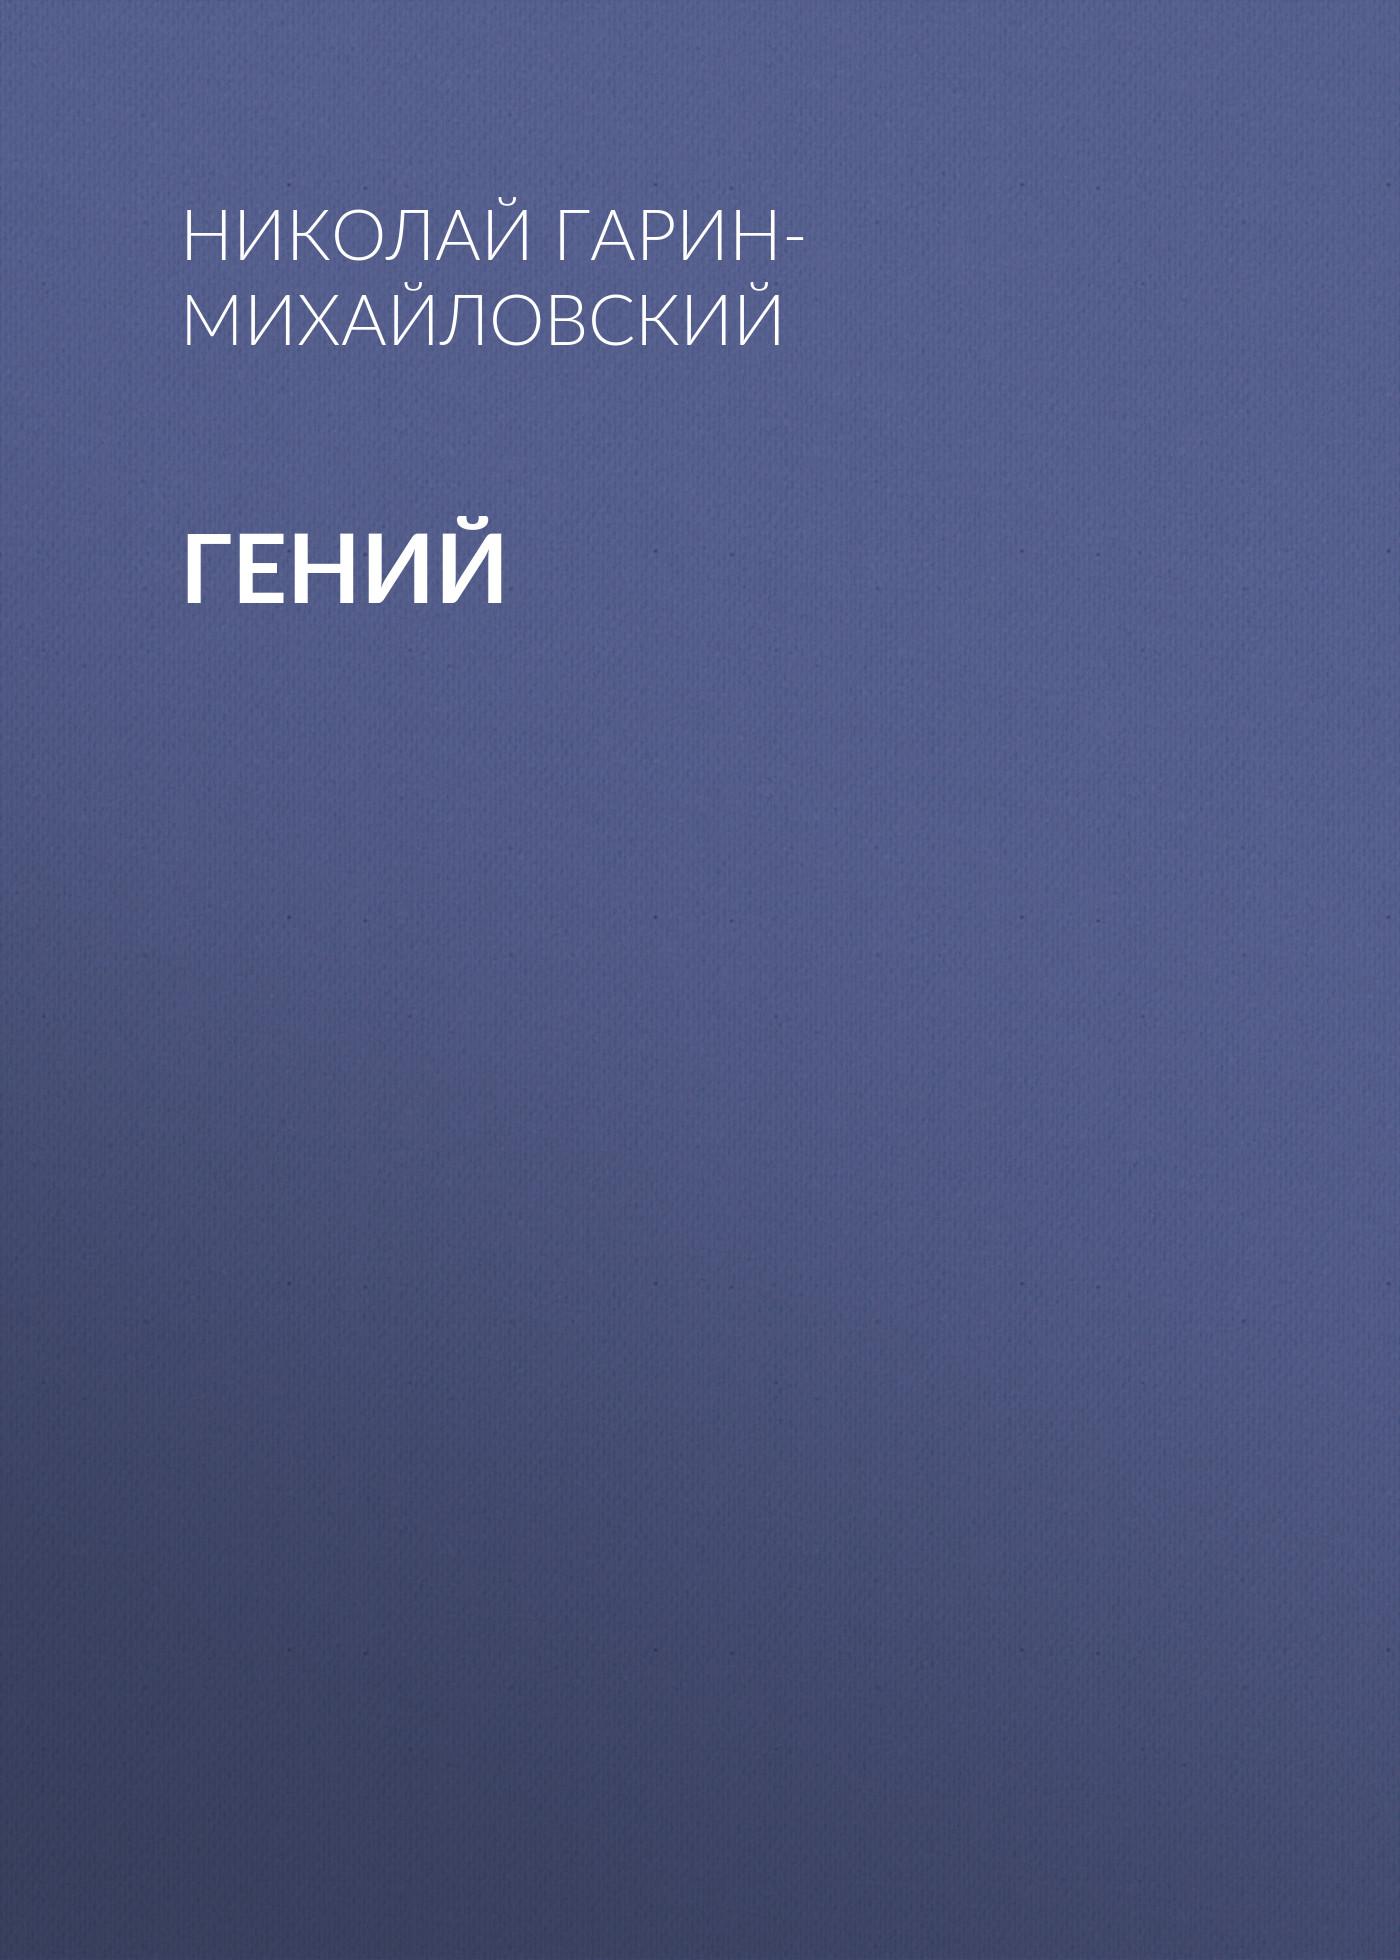 Николай Гарин-Михайловский Гений цена